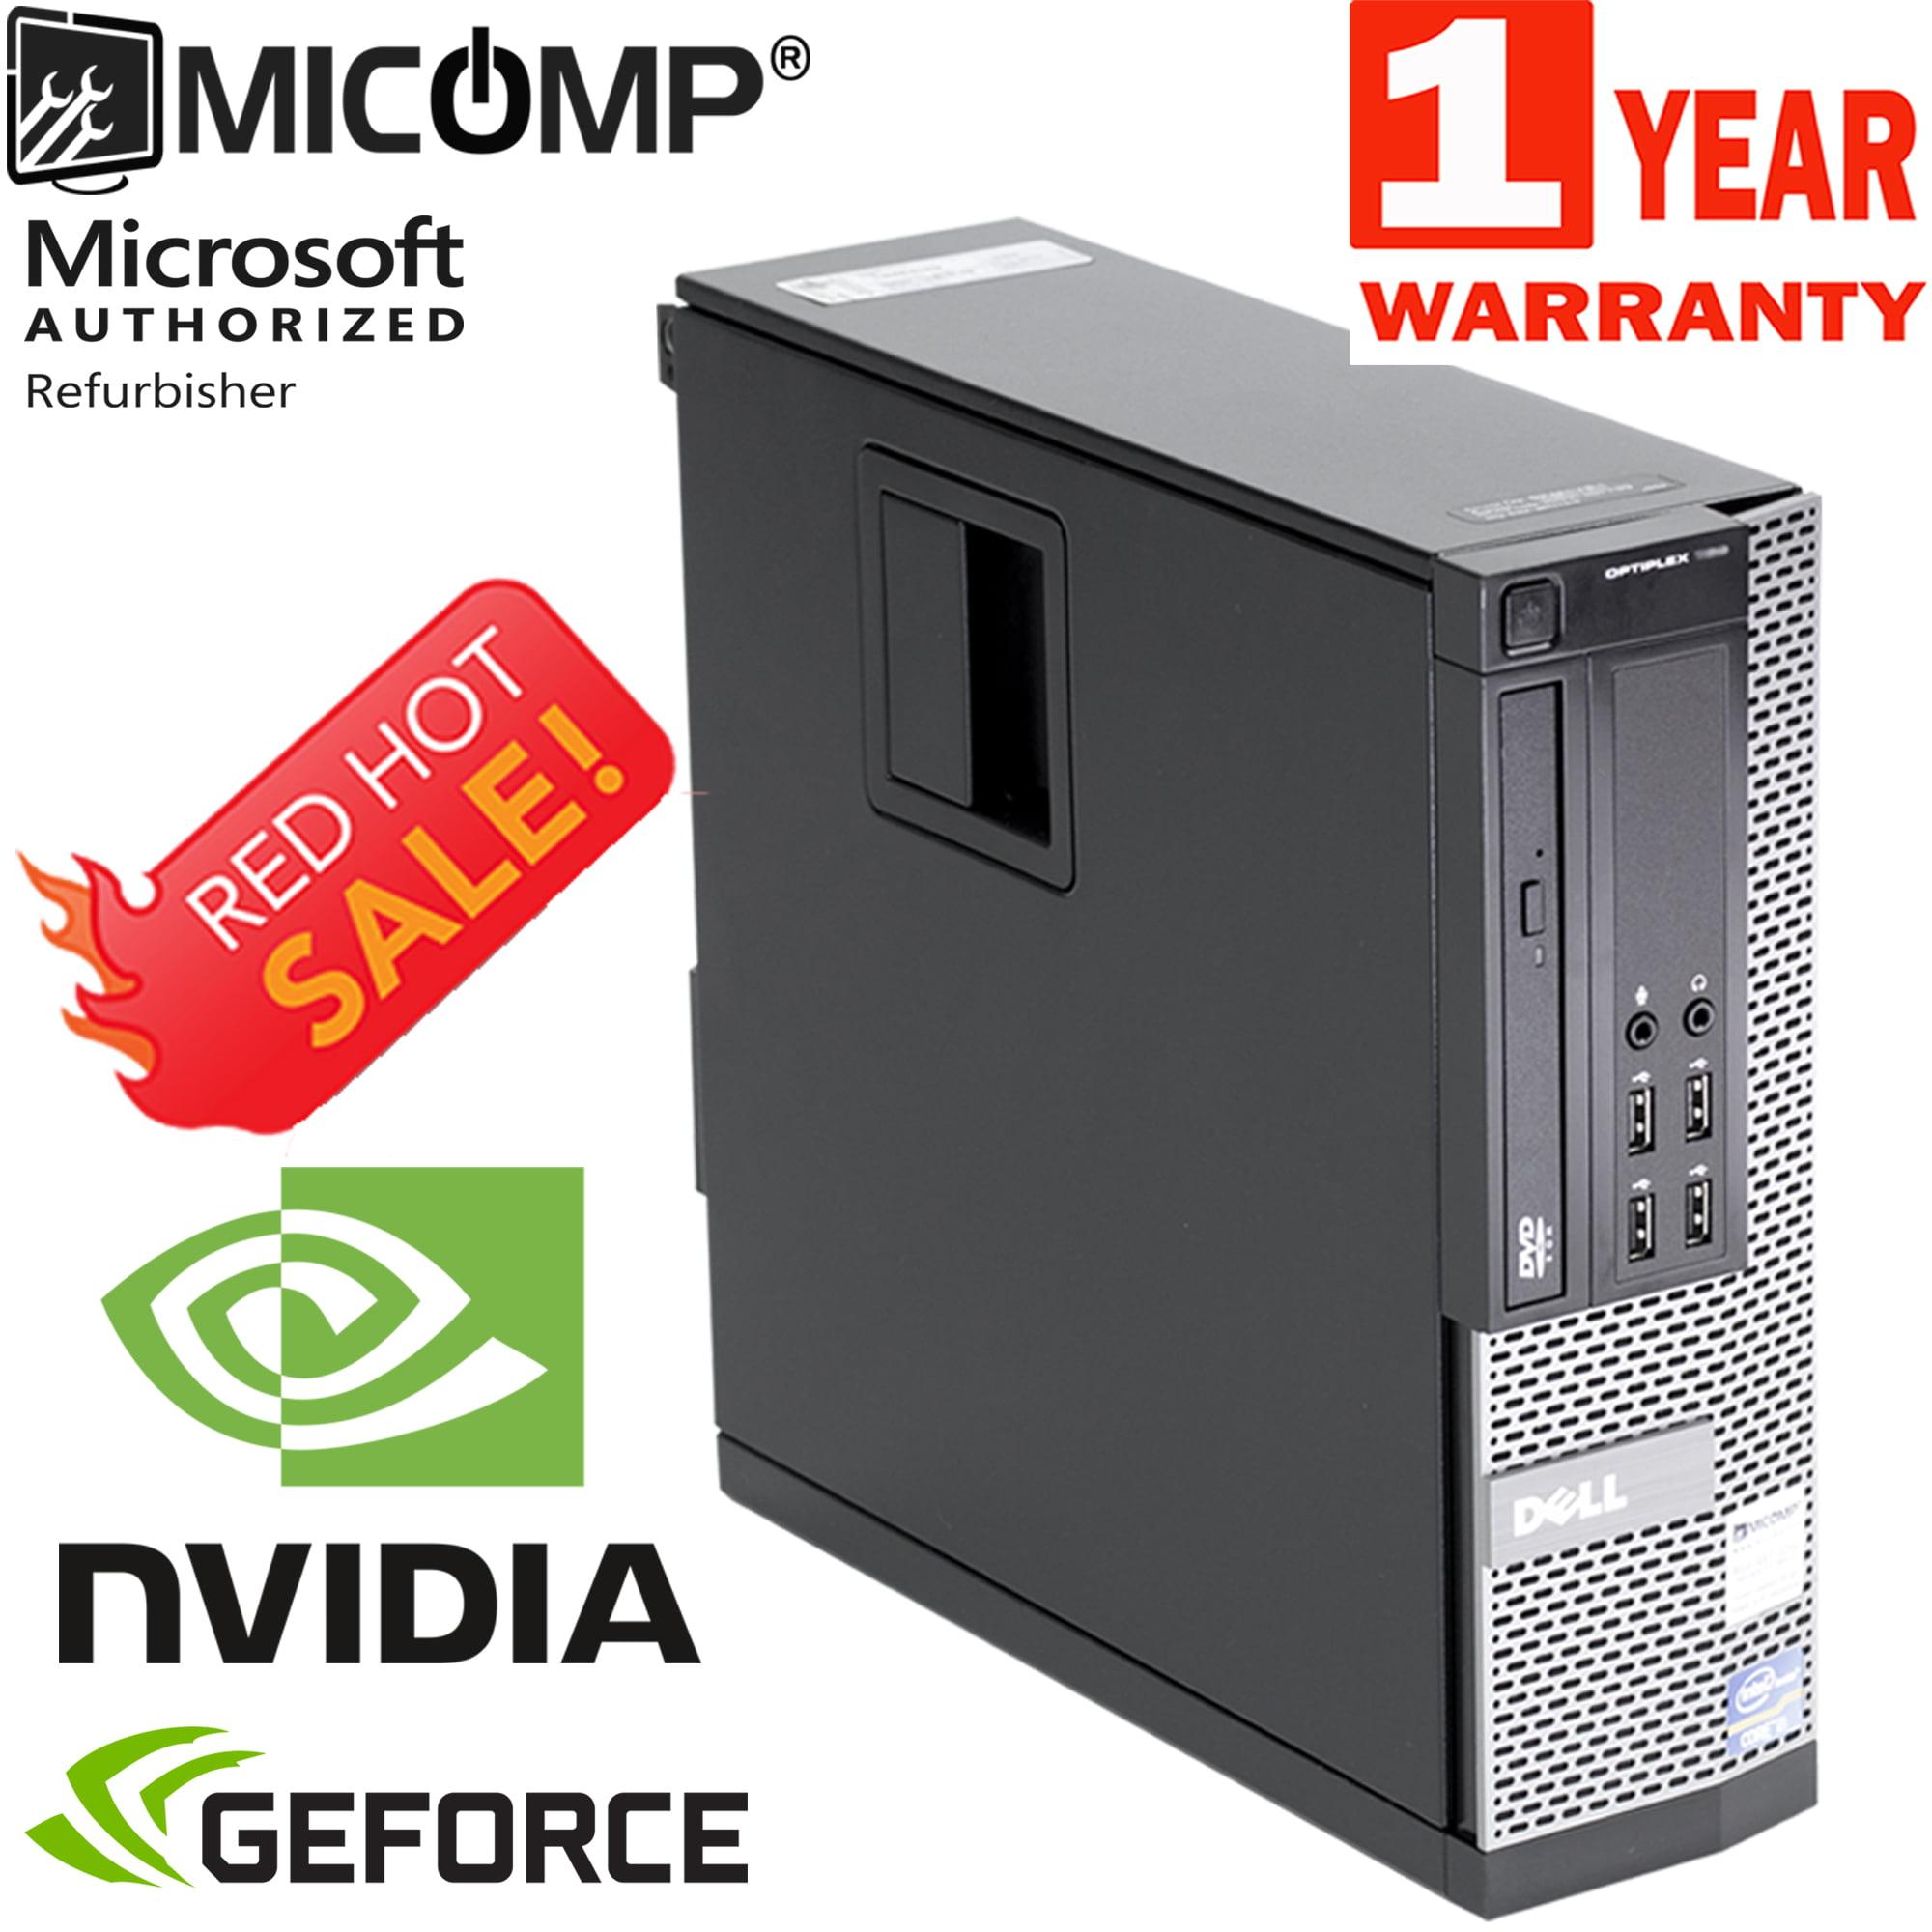 Refurbished Dell Gaming Computer Nvidia GT 1030 HDMI WiFi Quad i5 3.1GHz 8GB 500GB Windows 10